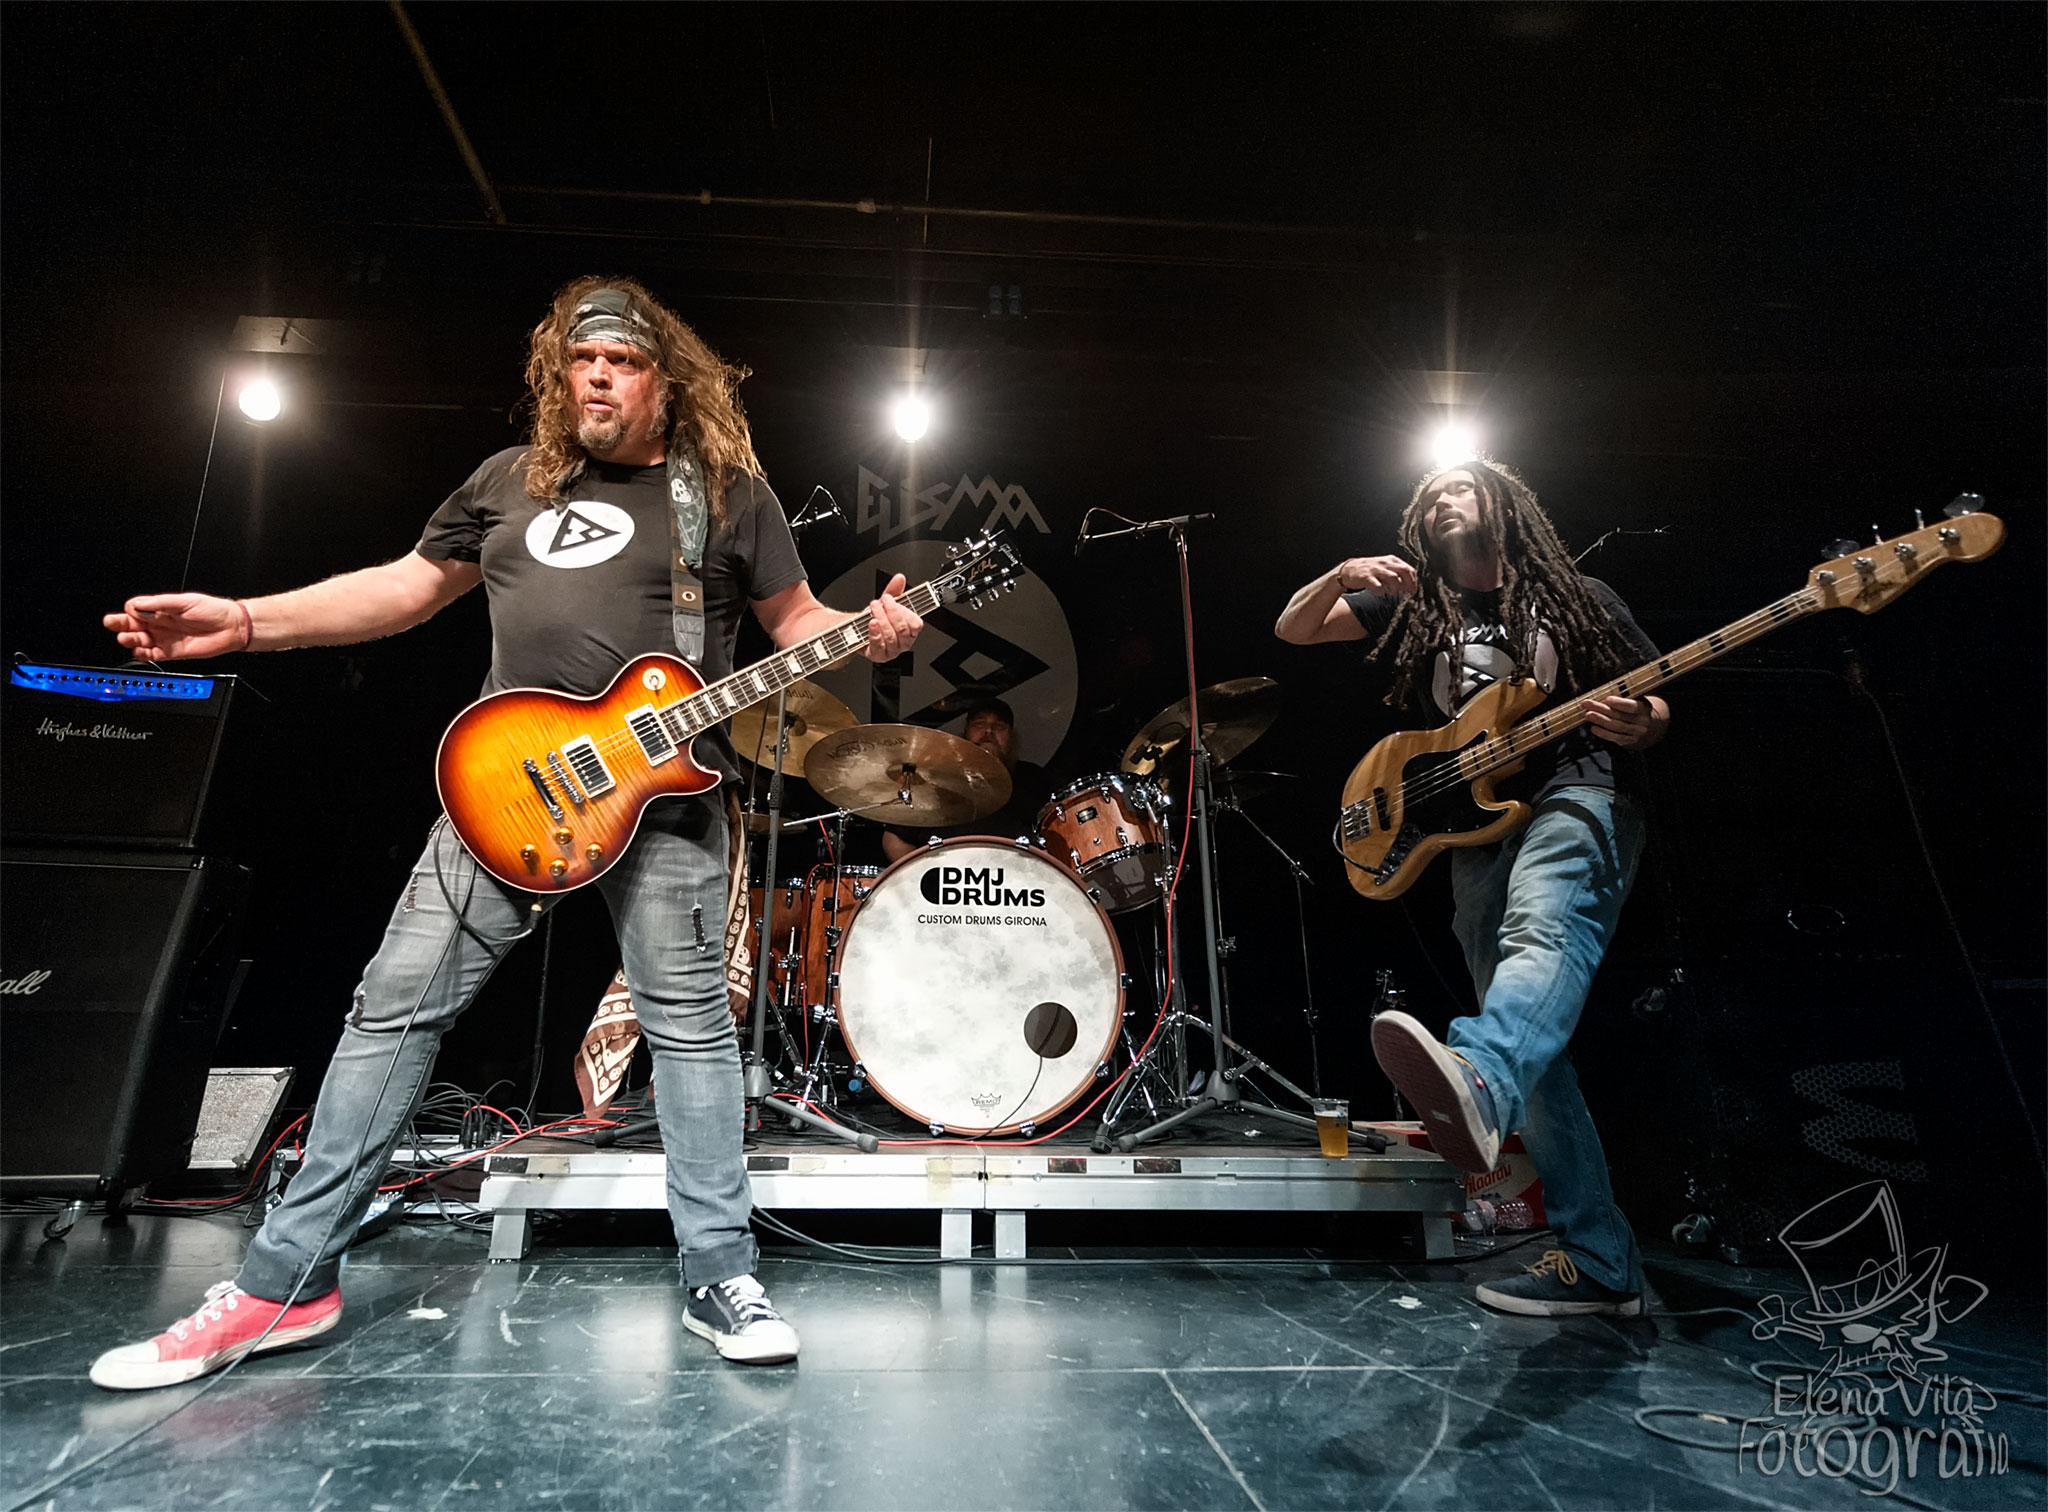 Elisma rock'n'civic 9